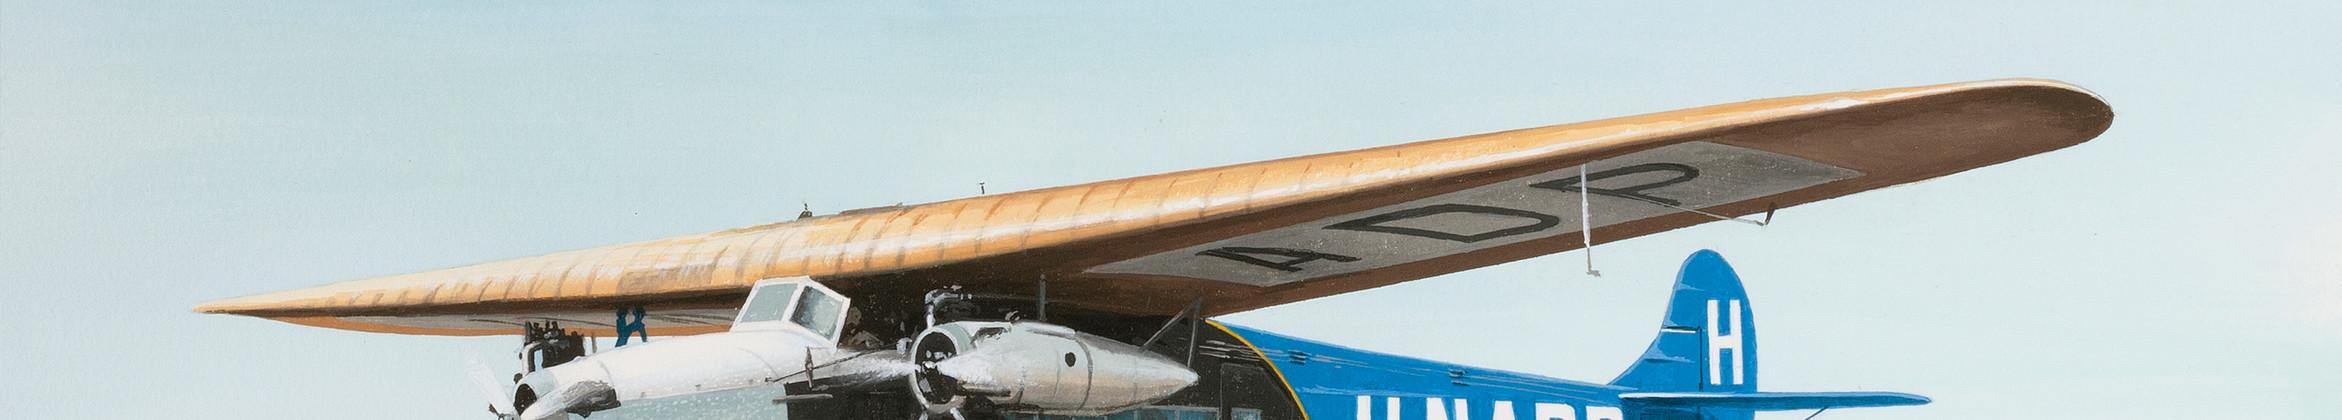 13-1 Fokker F 7 3m H-NADP vliegend.jpg